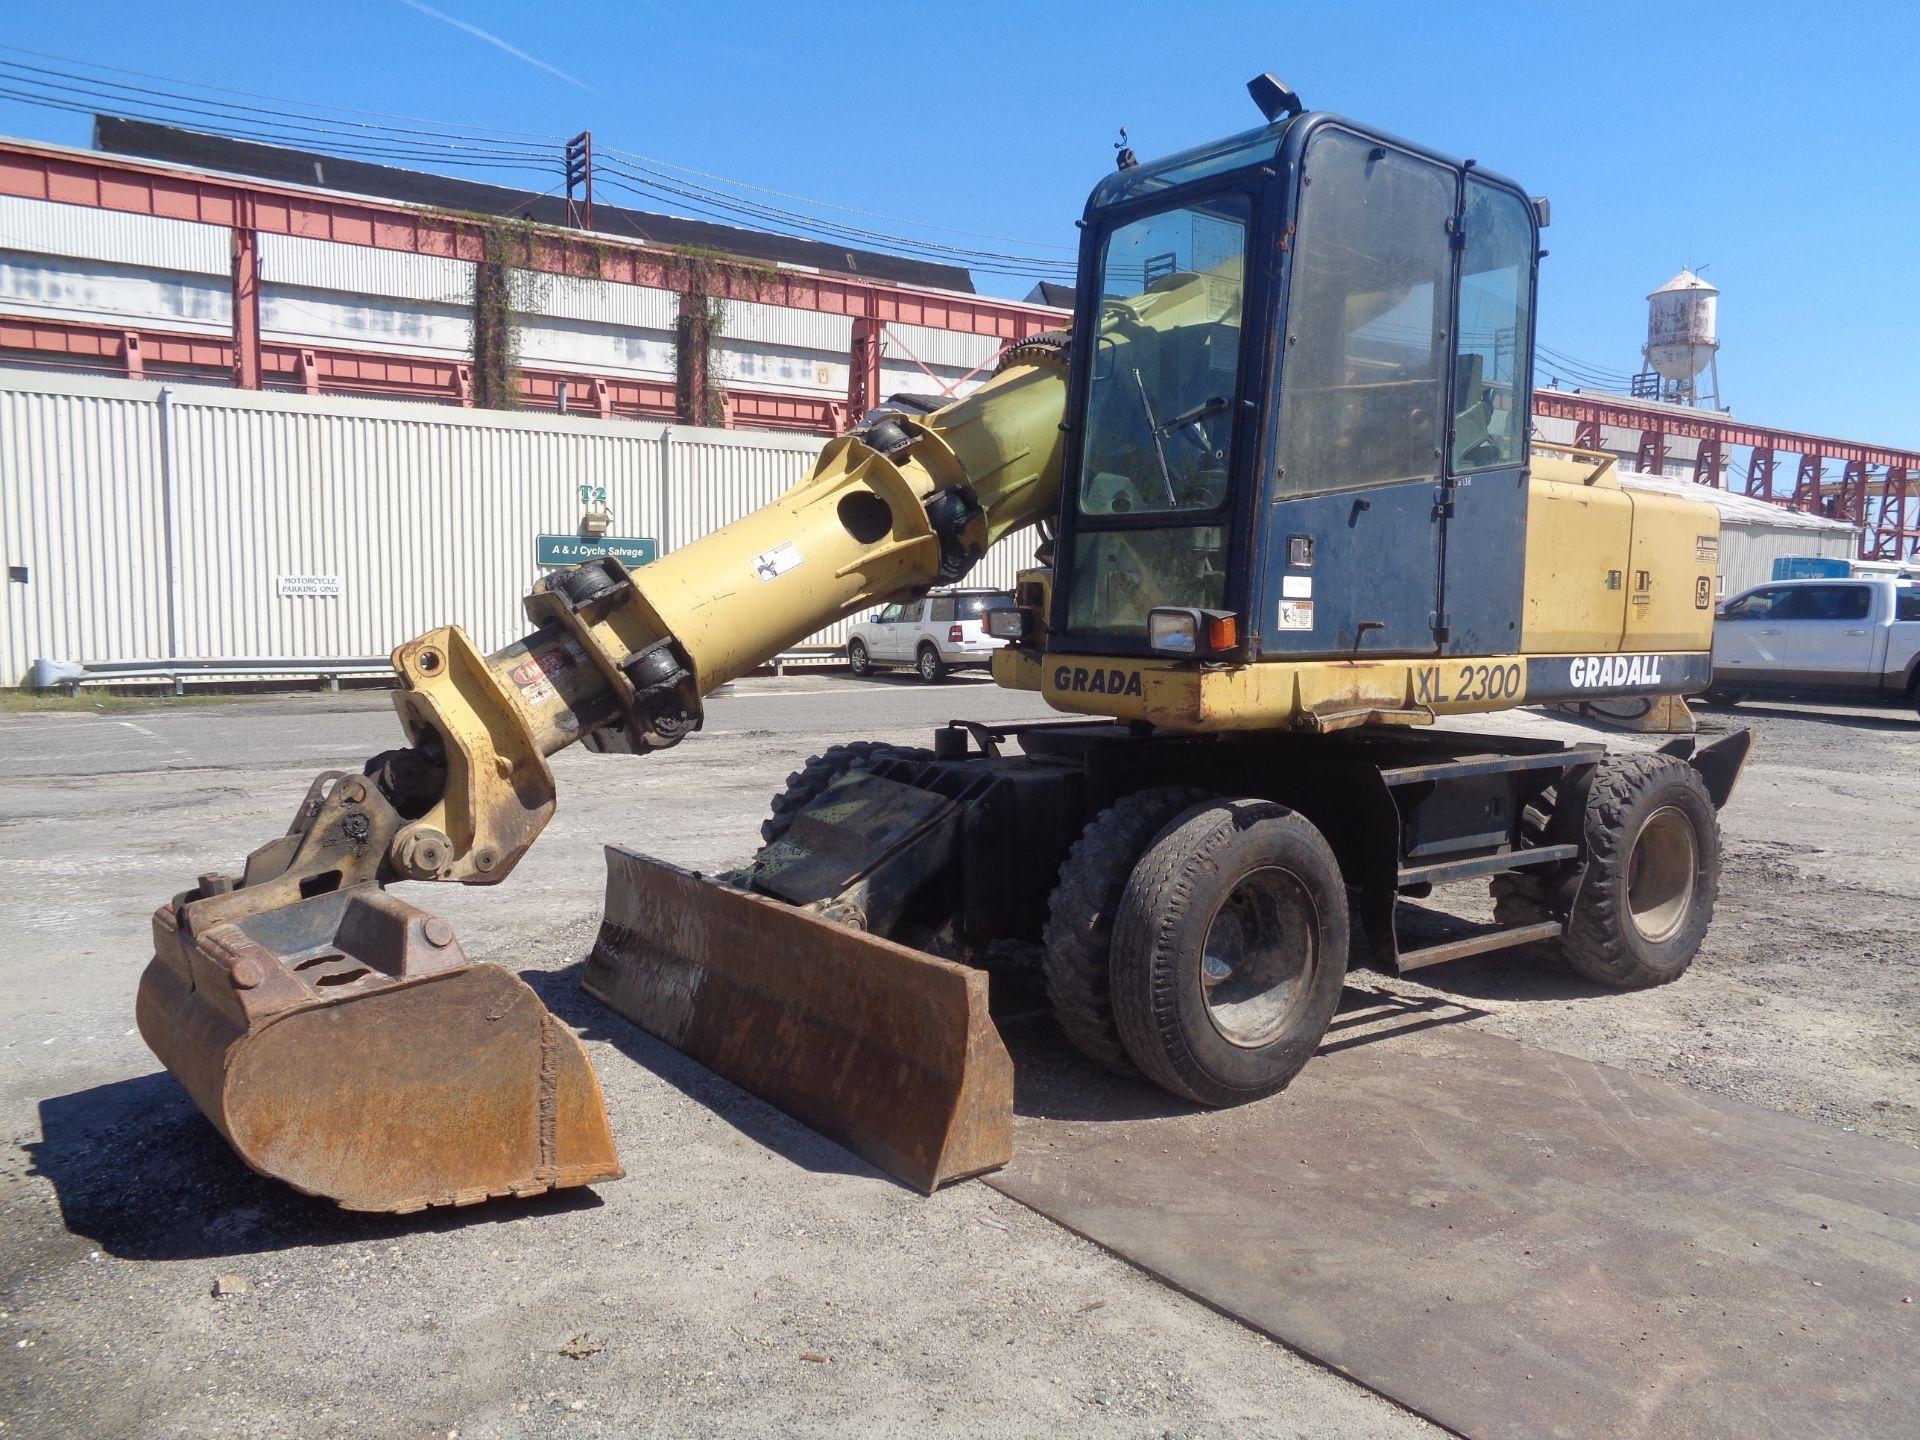 Lot 36 - 2003 Gradall XL2300 Wheel Excavator